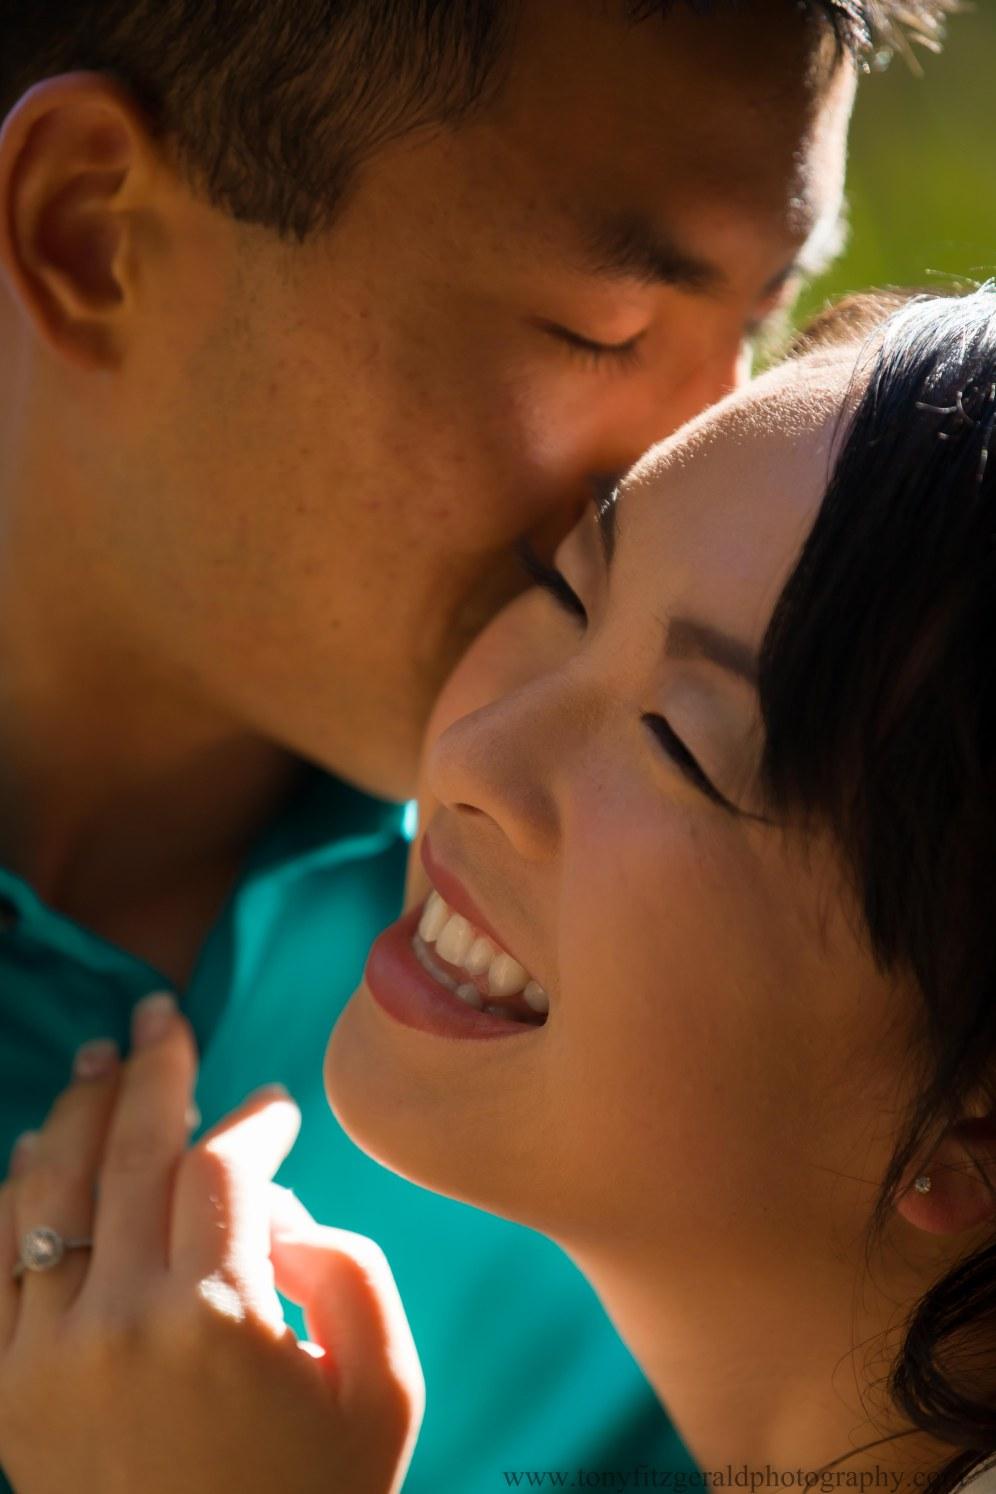 Engagement photos in Santa Cruz (1 of 11)